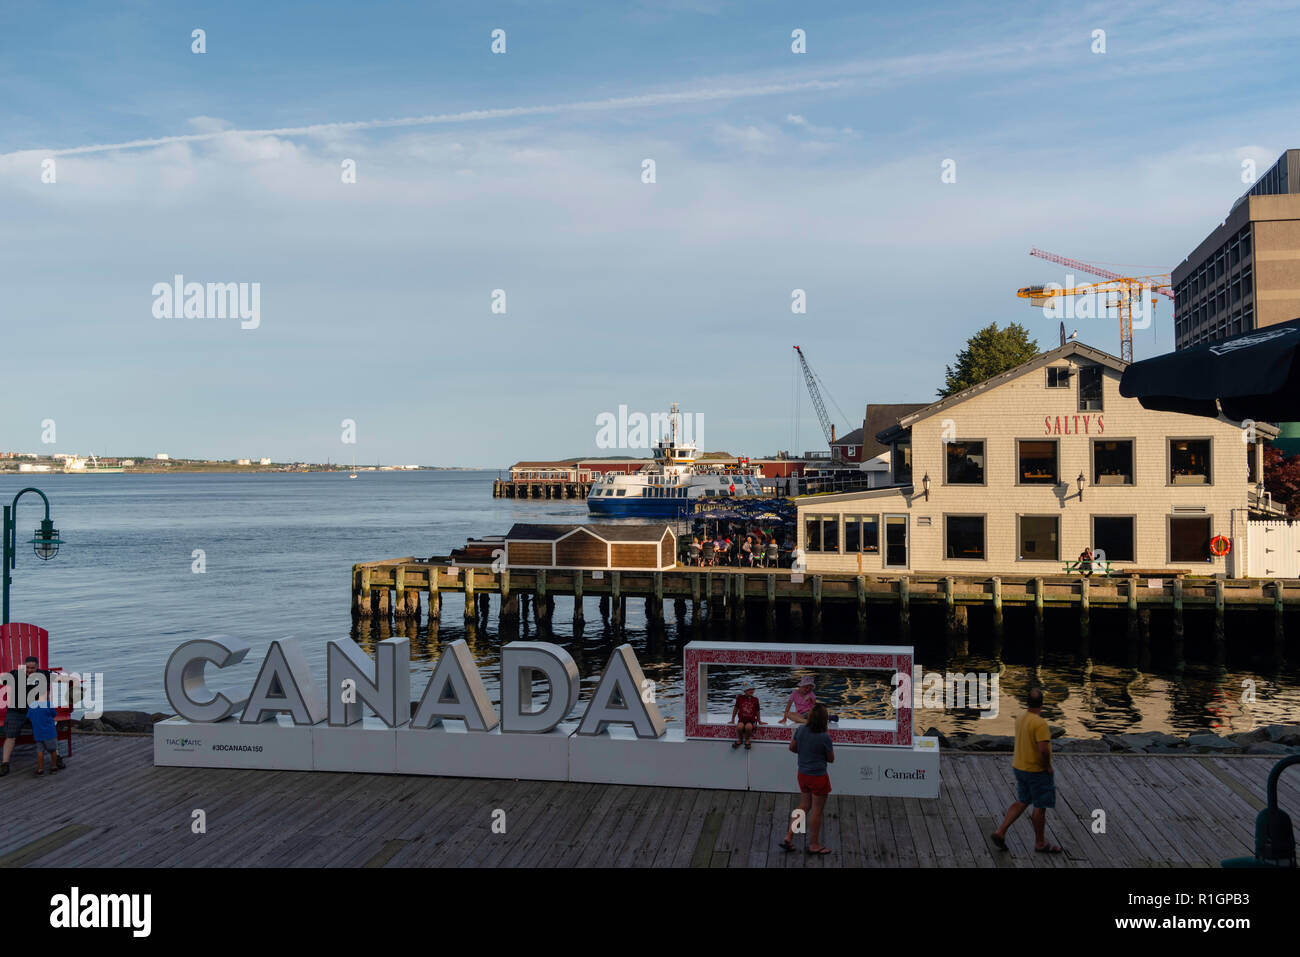 Images from a walk along Halifax Harbor. Halifax, Nova Scotia, Canada. Stock Photo